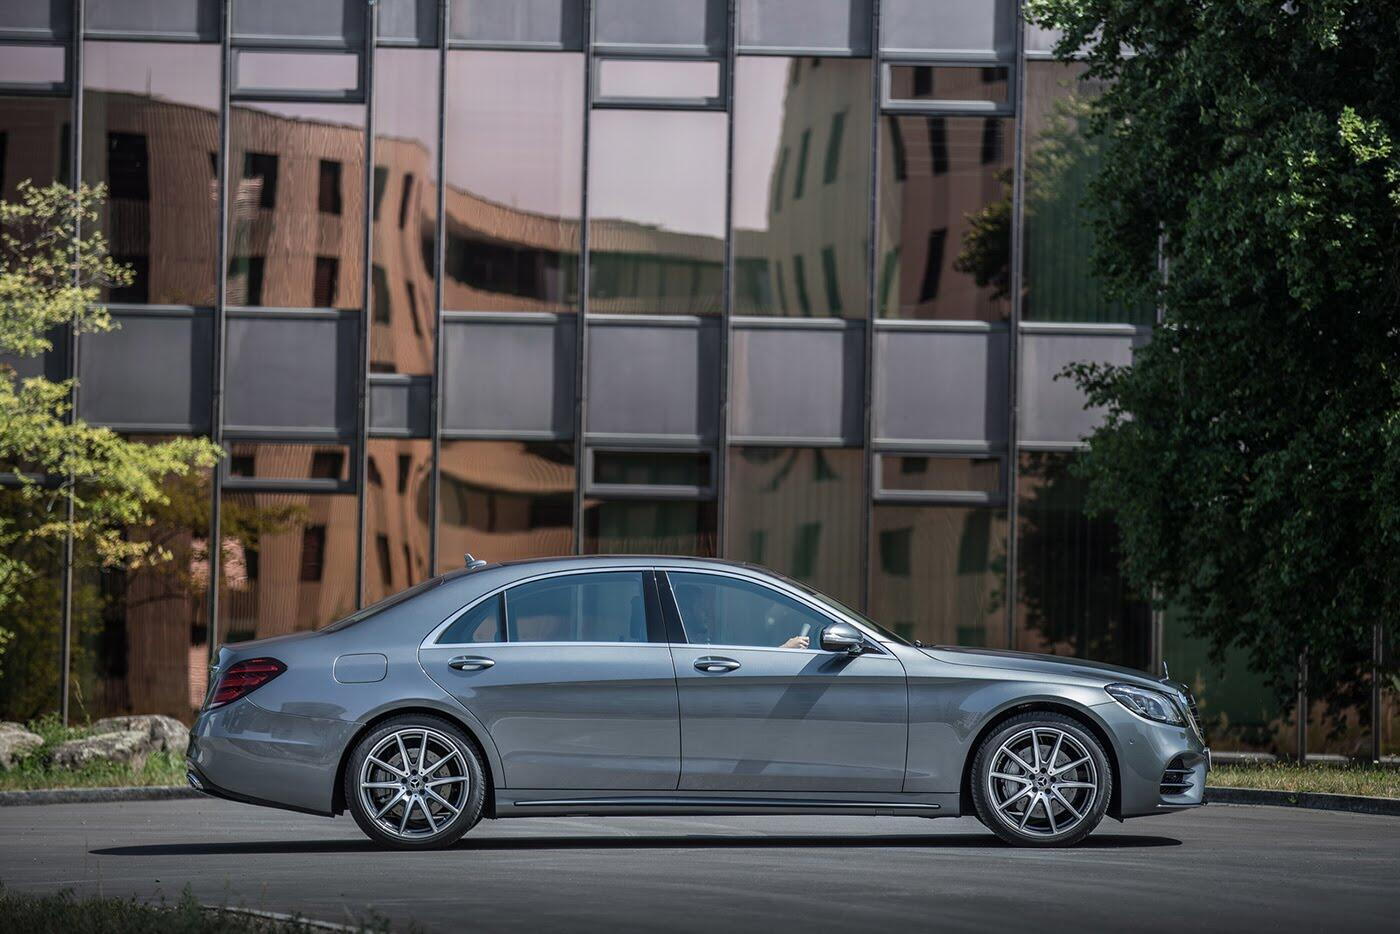 Ảnh chi tiết Mercedes-Benz S-Class 2018 - Hình 29